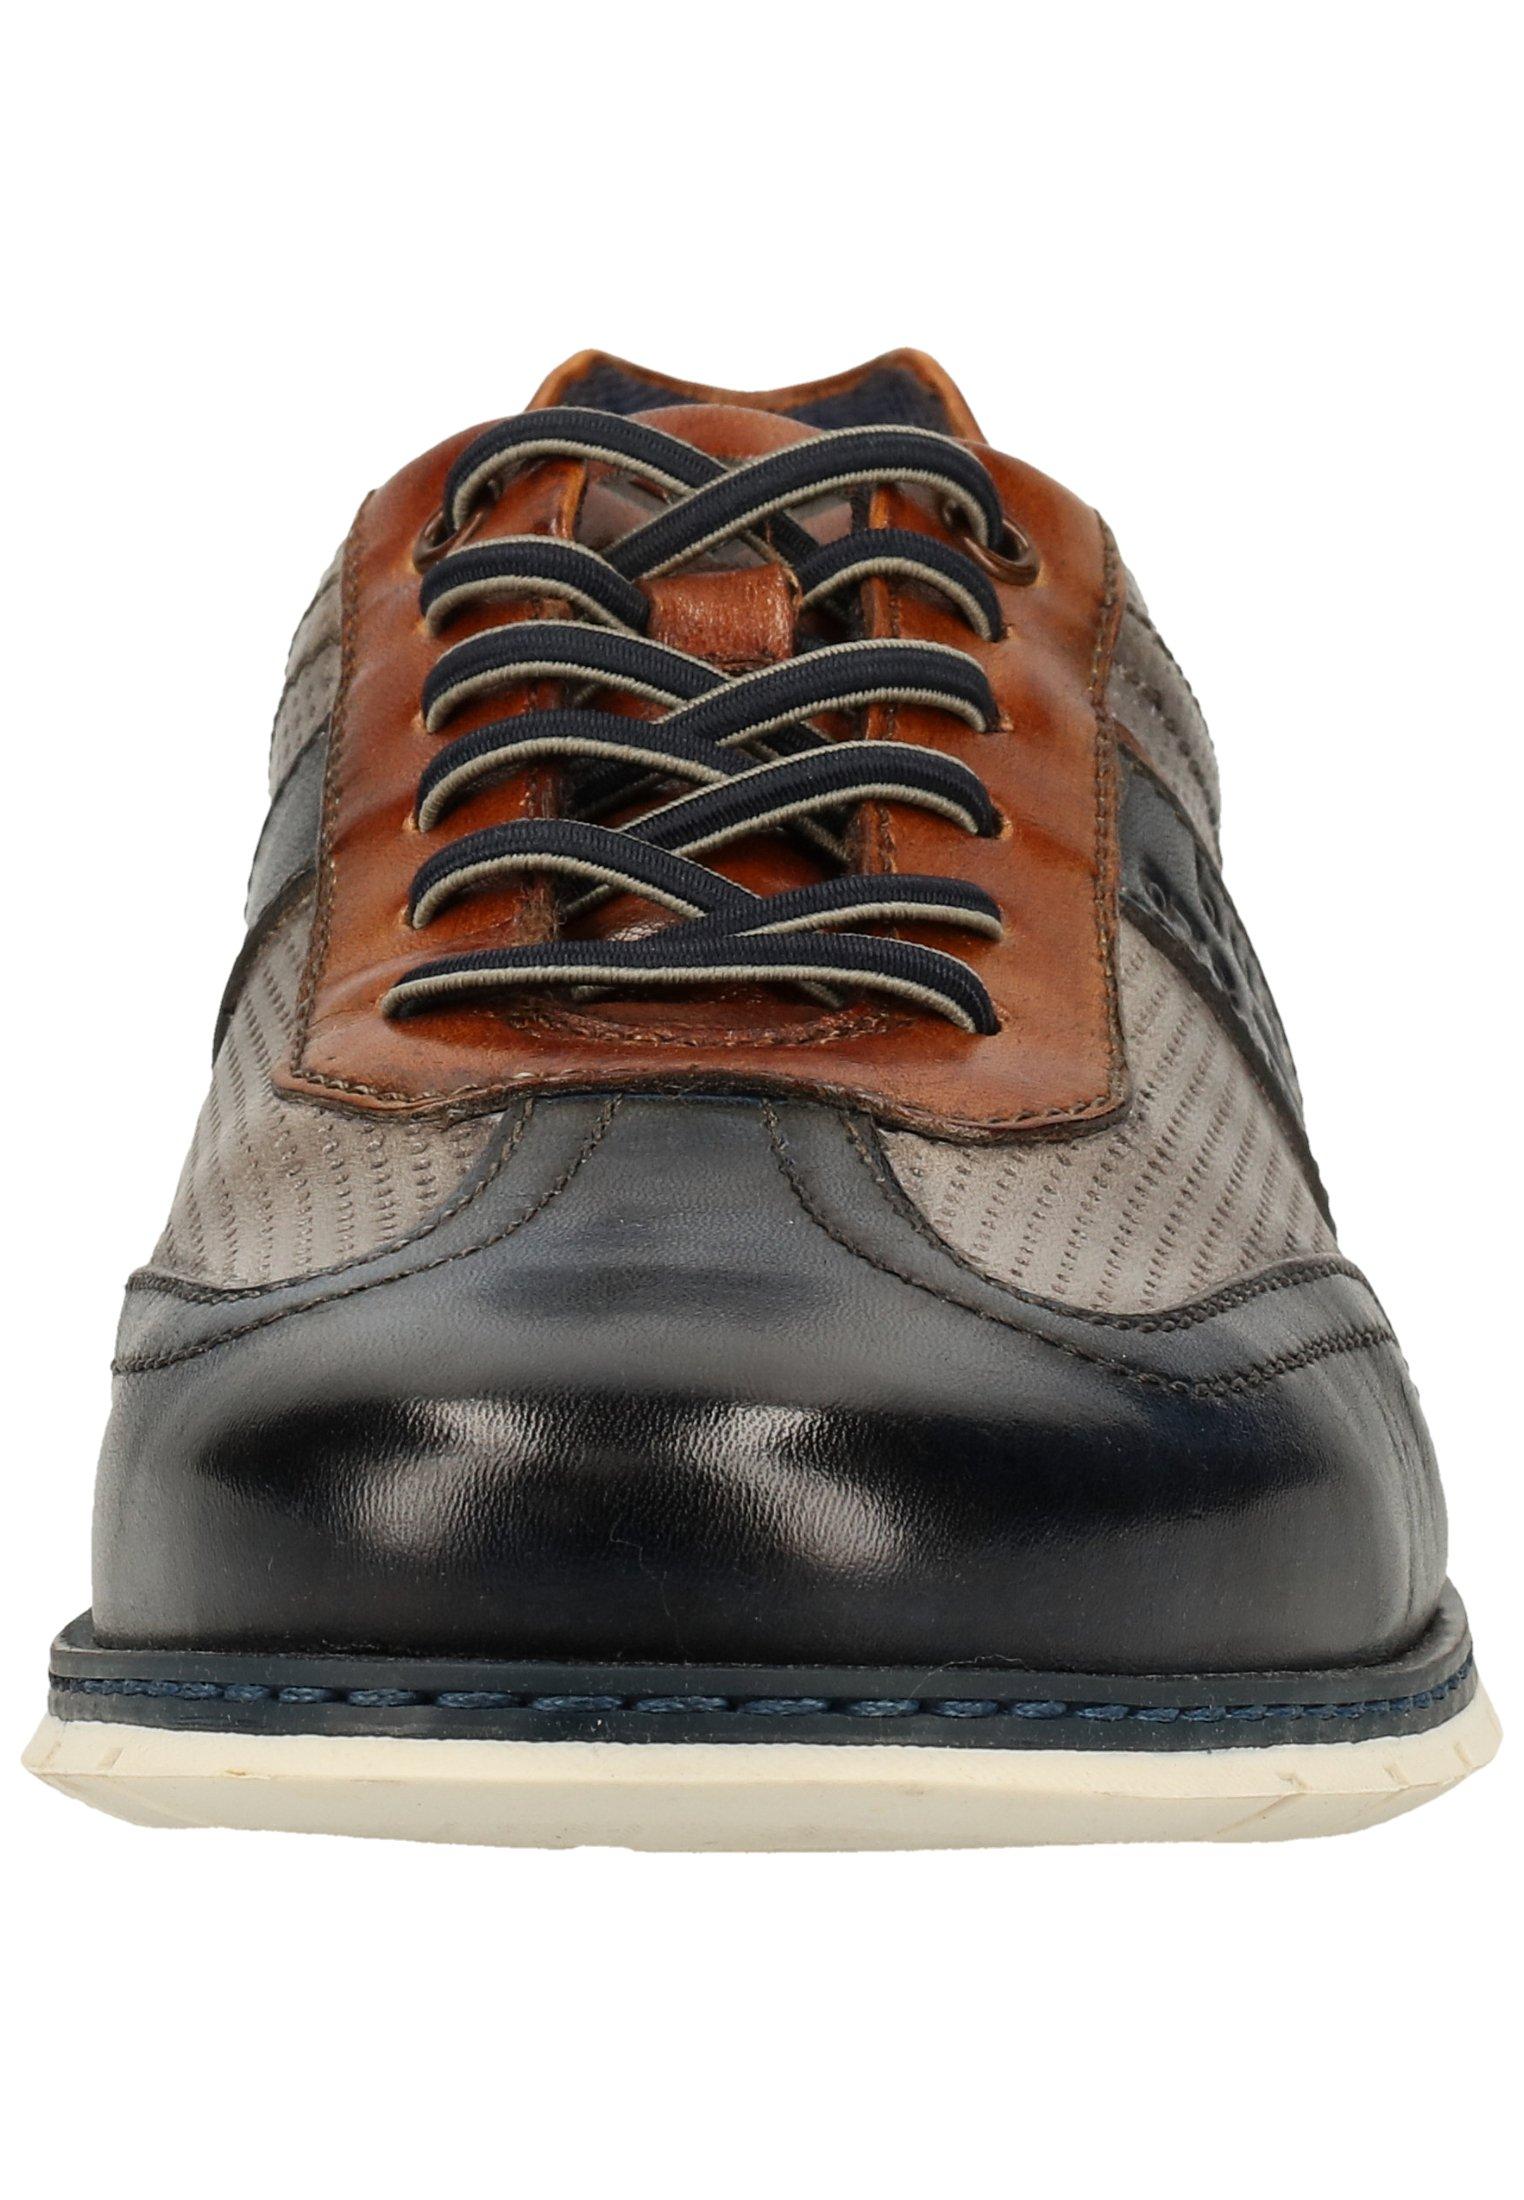 Homme Chaussures à lacets - dark blue/grey